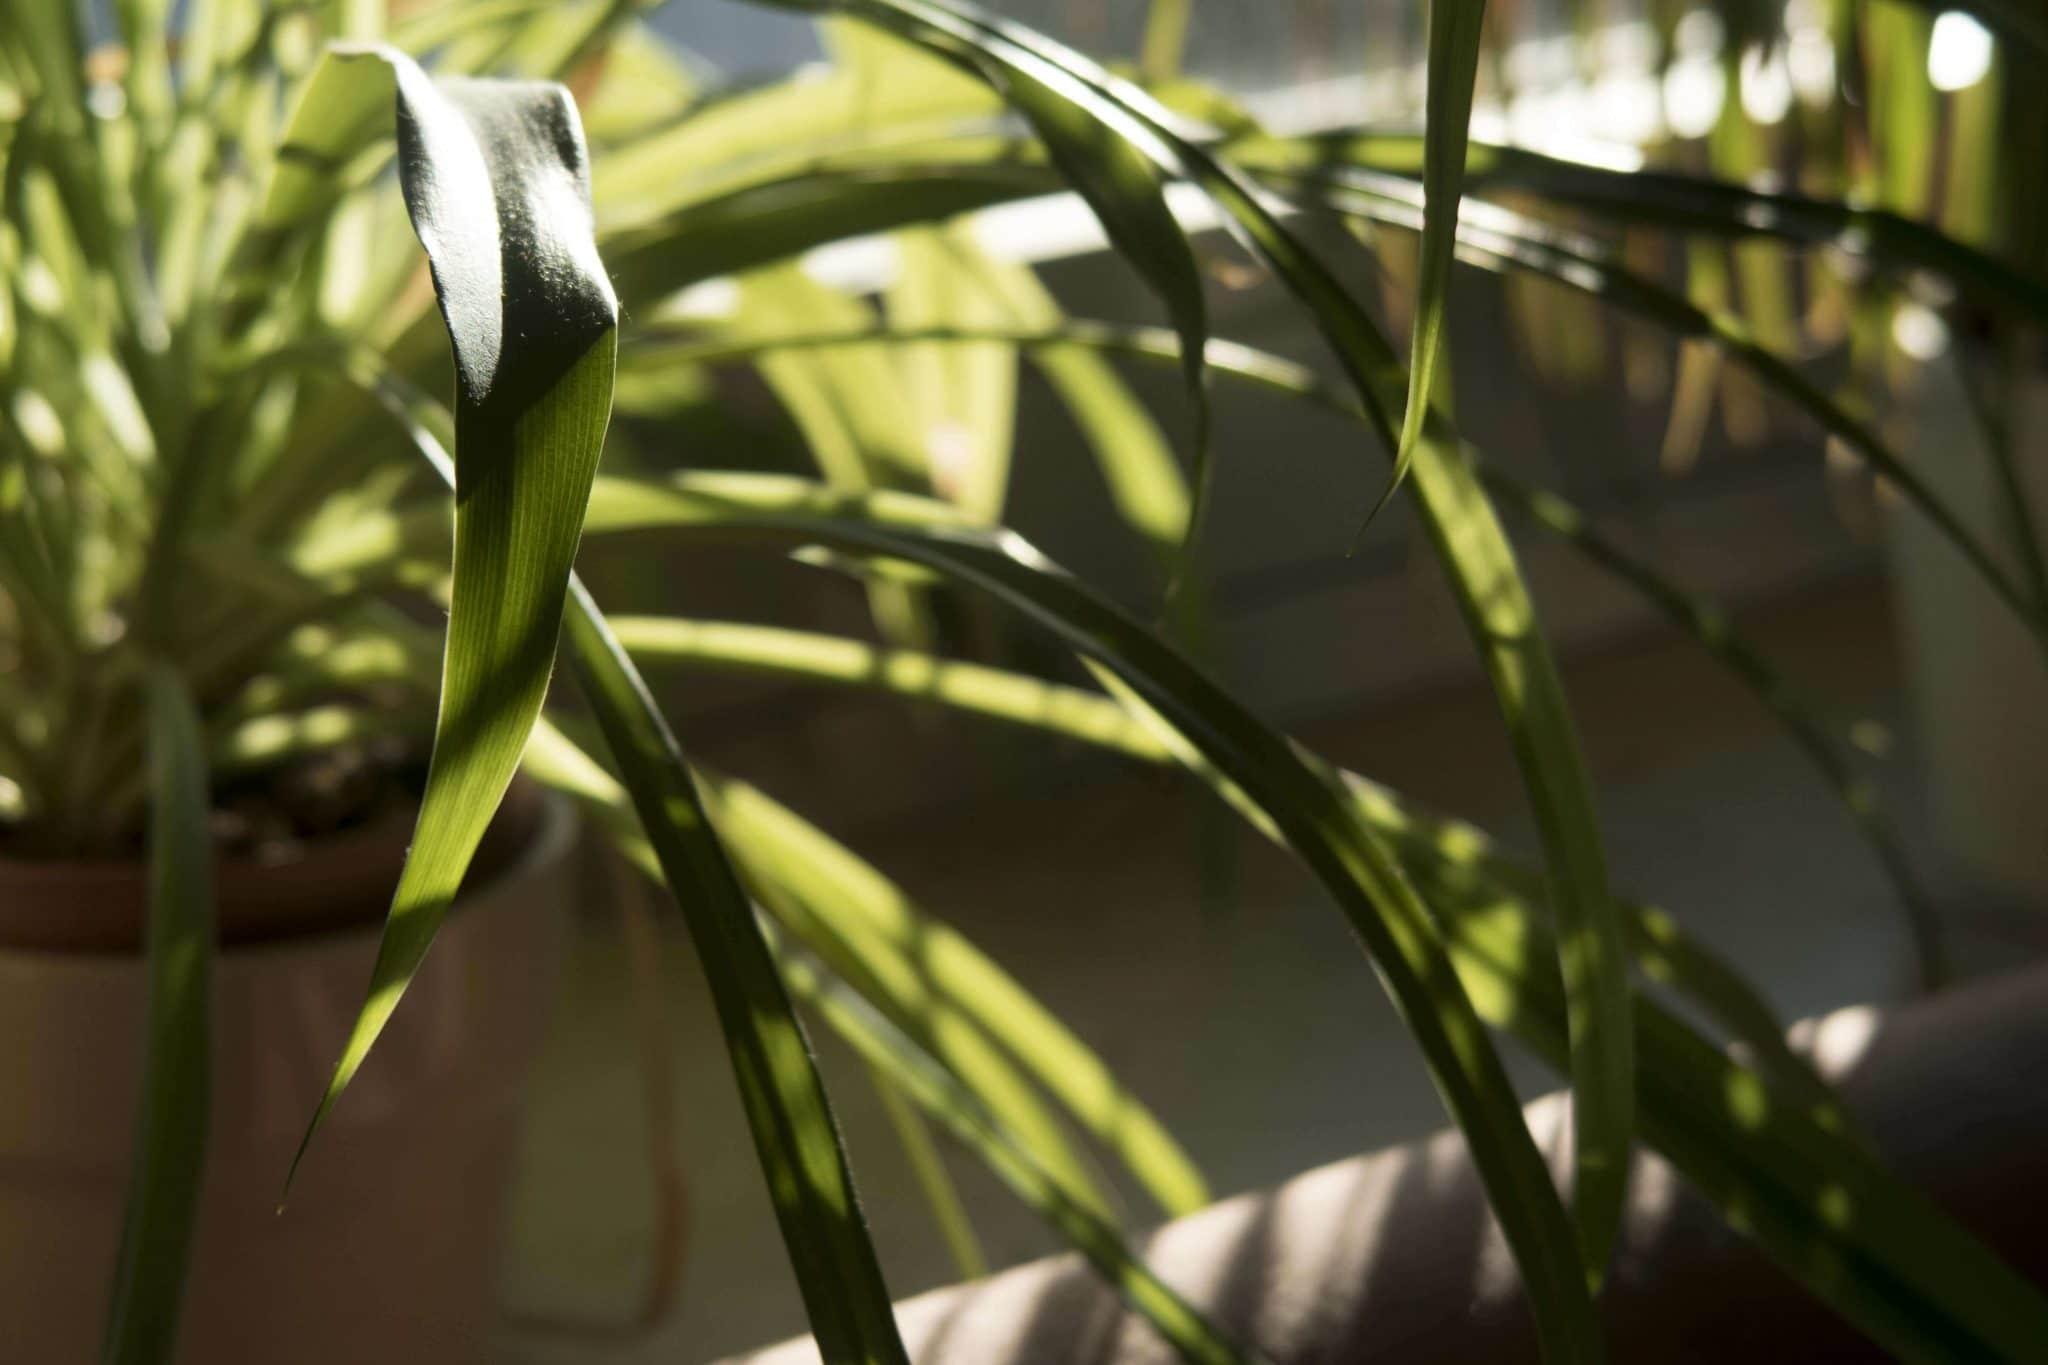 gruenlilie_komp